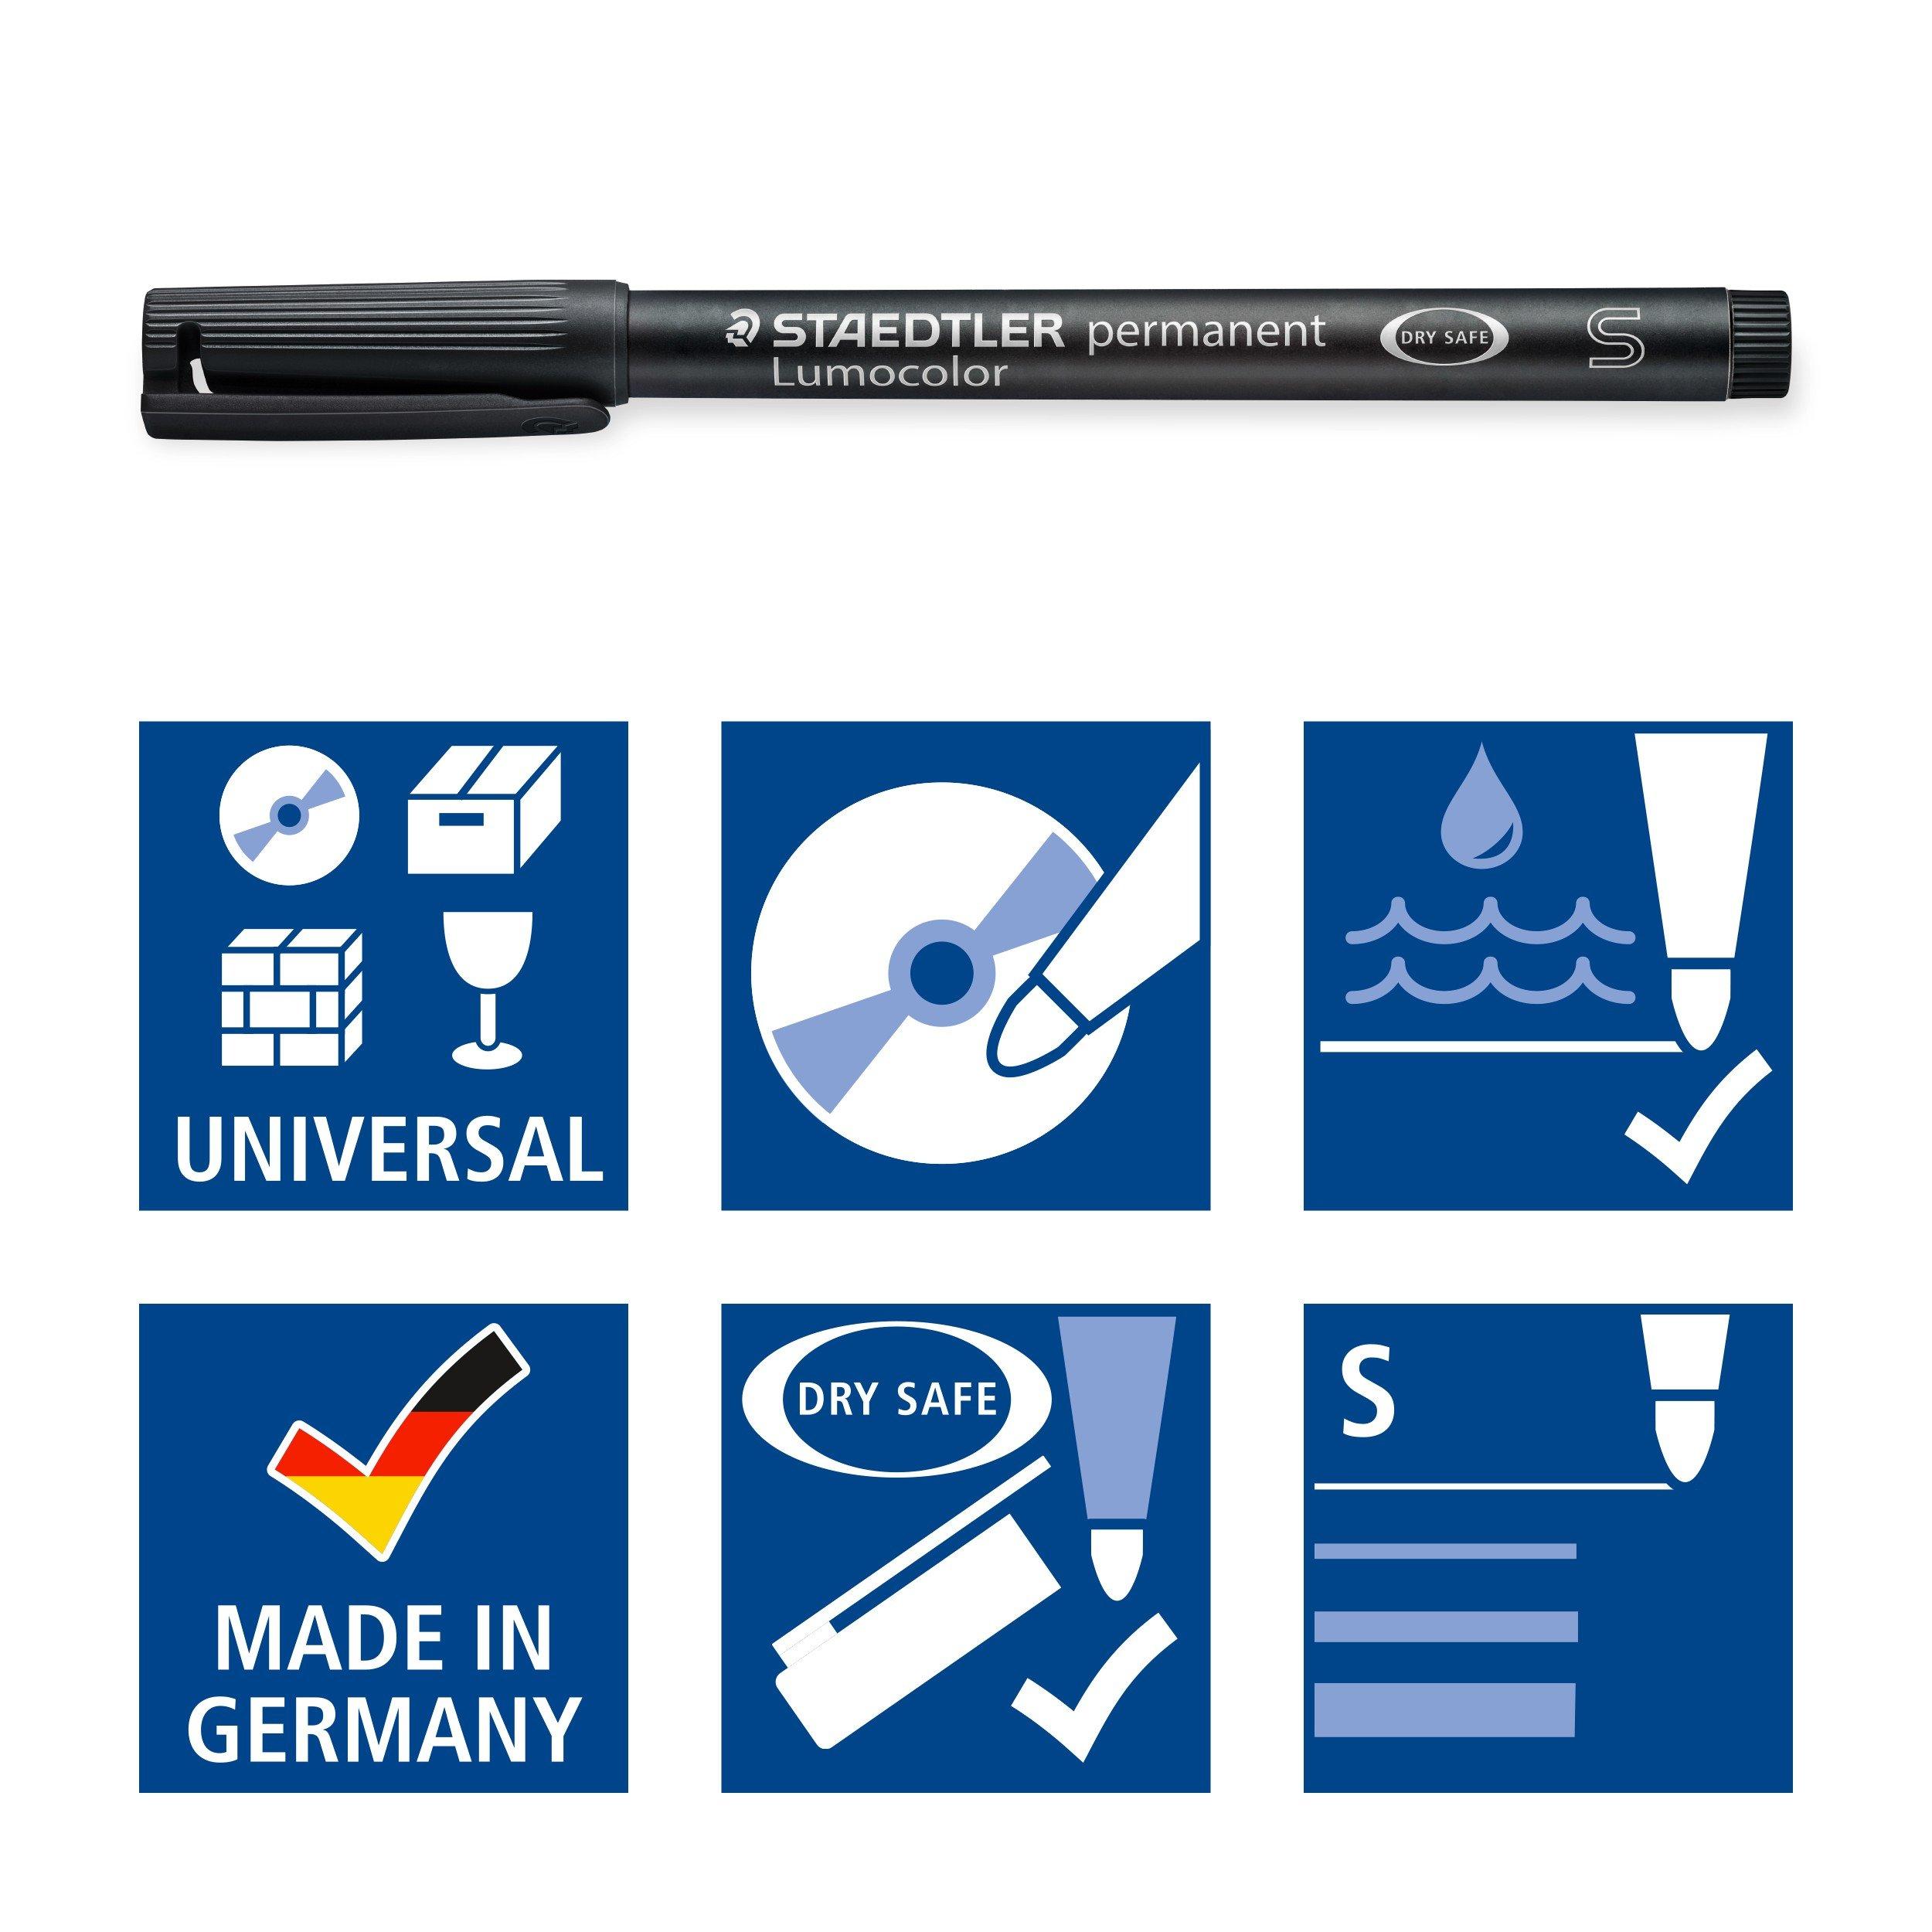 Staedtler 313-9 Lumocolor Universal Permanent Superfine Pens - Black, Pack of 10 by Staedtler Mars GmbH & Co. (Image #5)